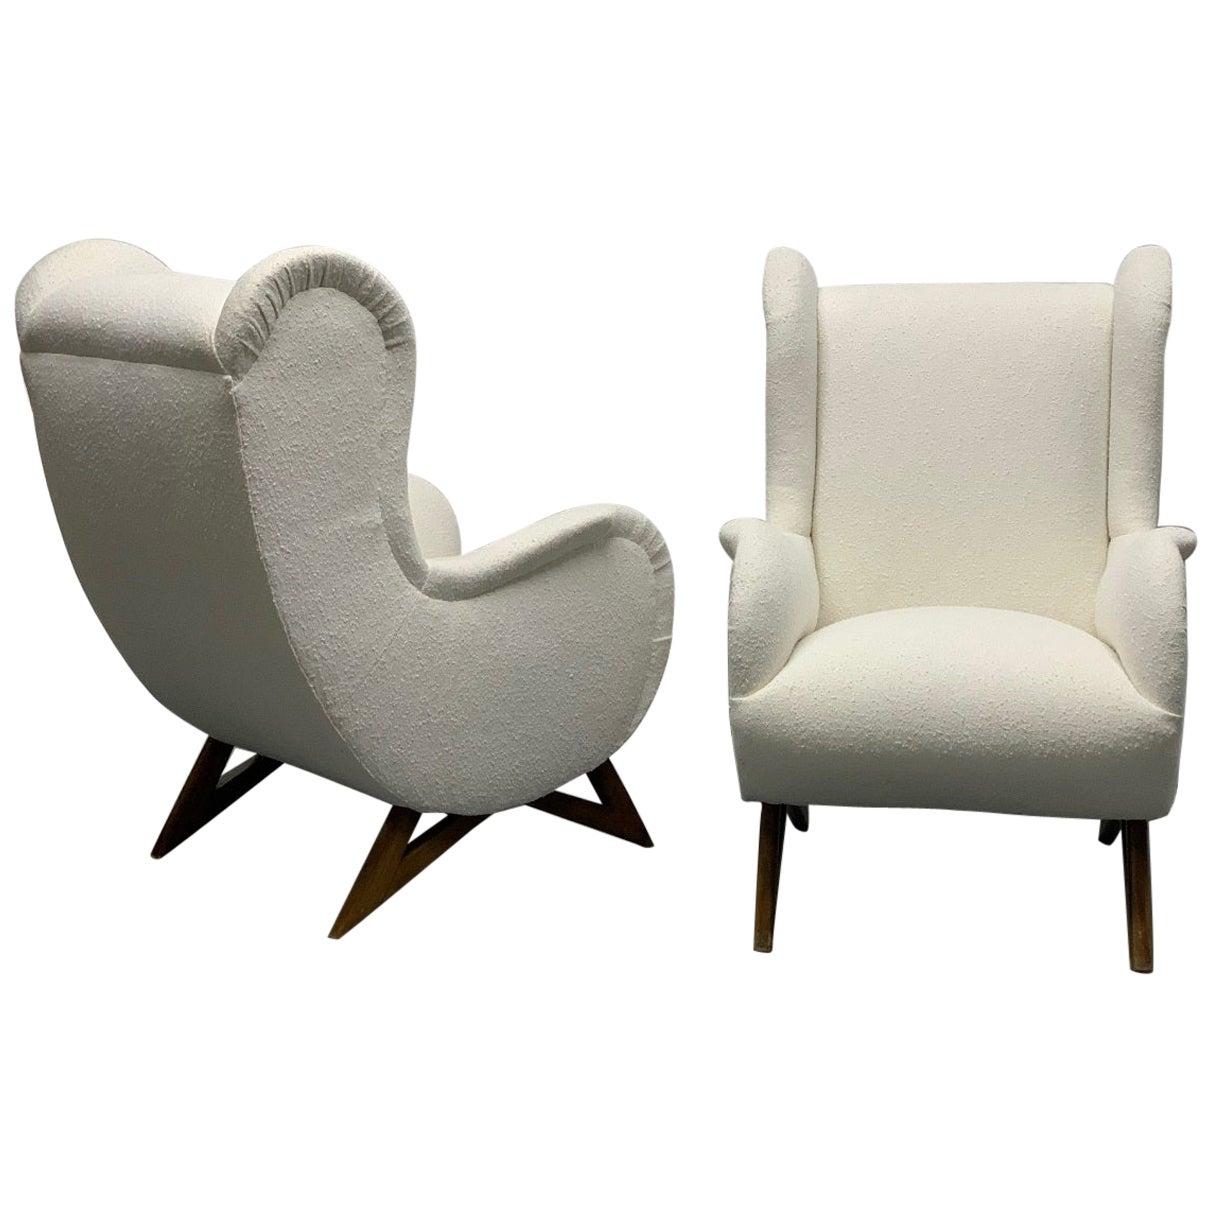 Pair of 1960s Italian Lounge Chairs